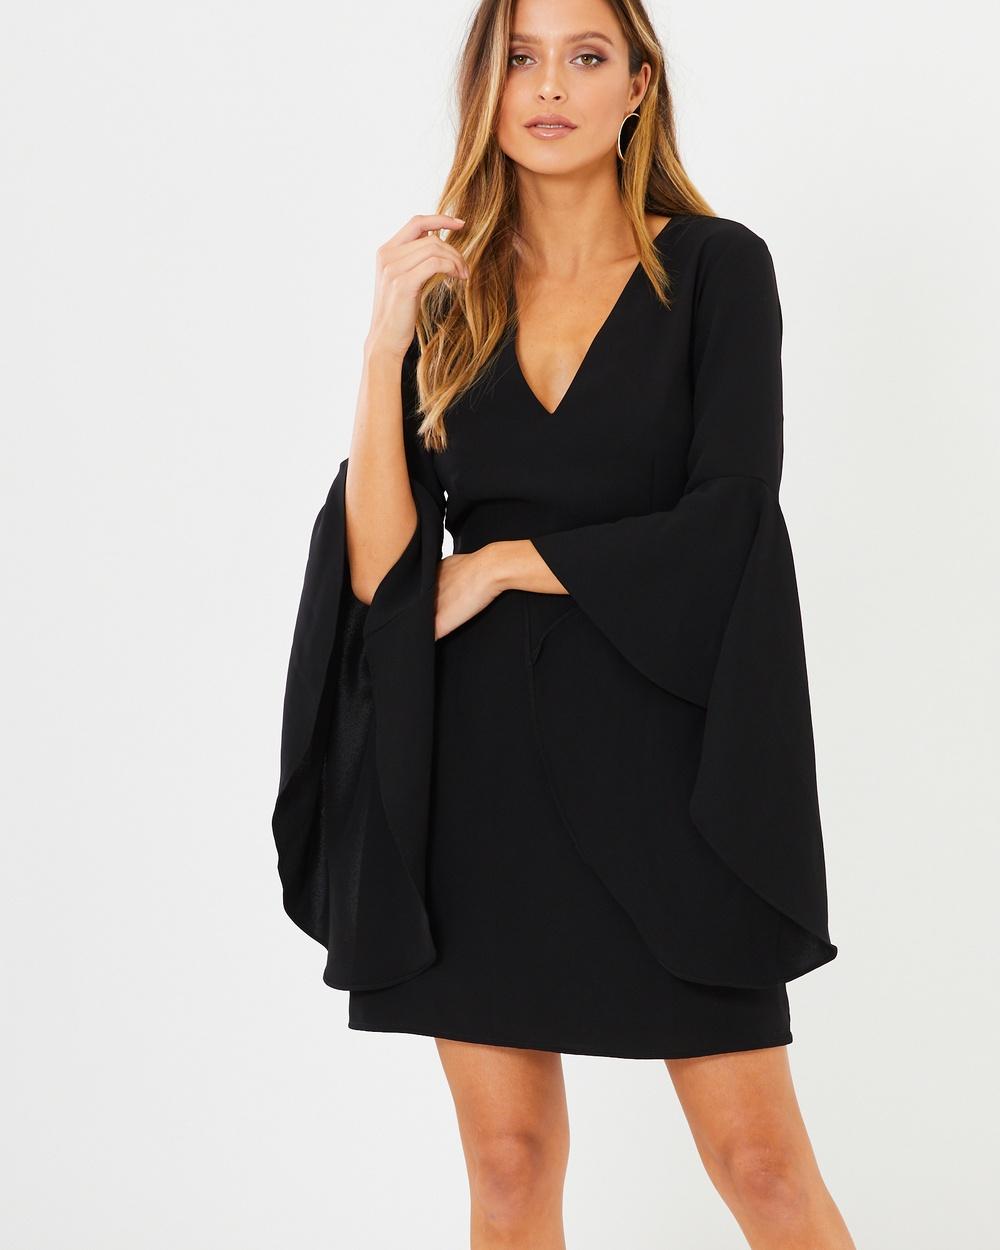 Photo of Tussah Black Rosanne Mini Dress - beautiful dress from Tussah online